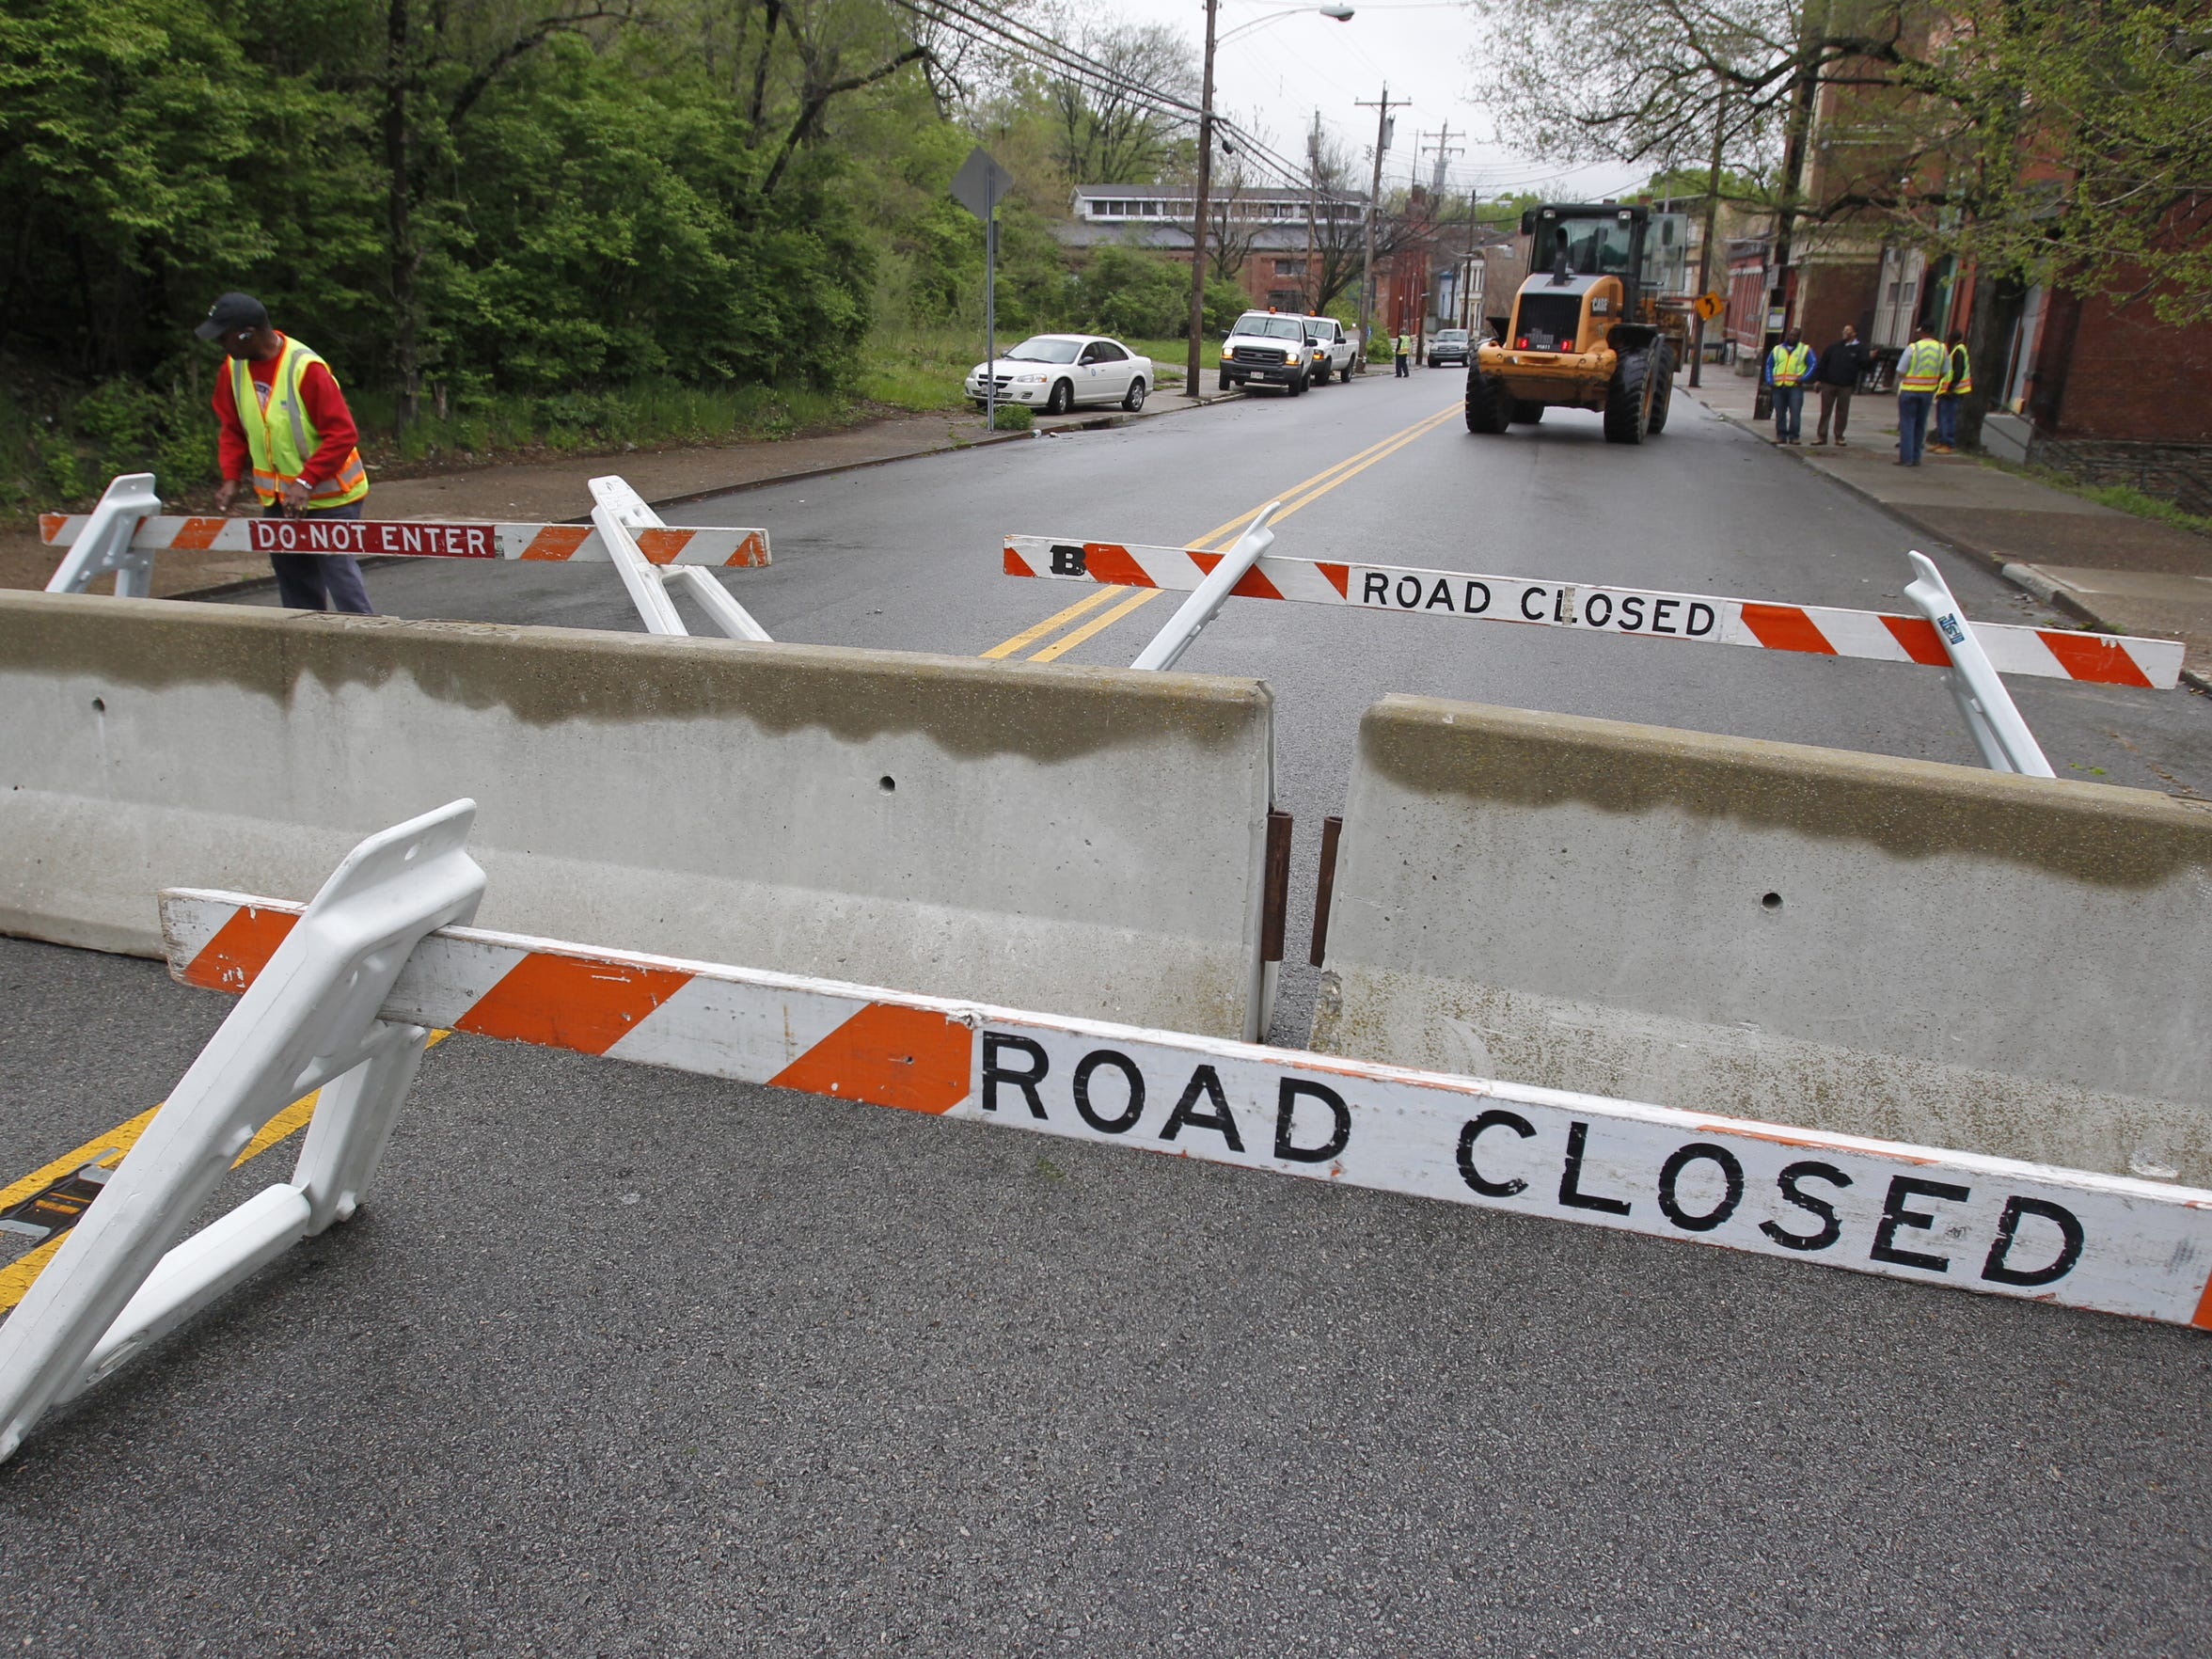 Cincinnati Police placed temporary barriers along West